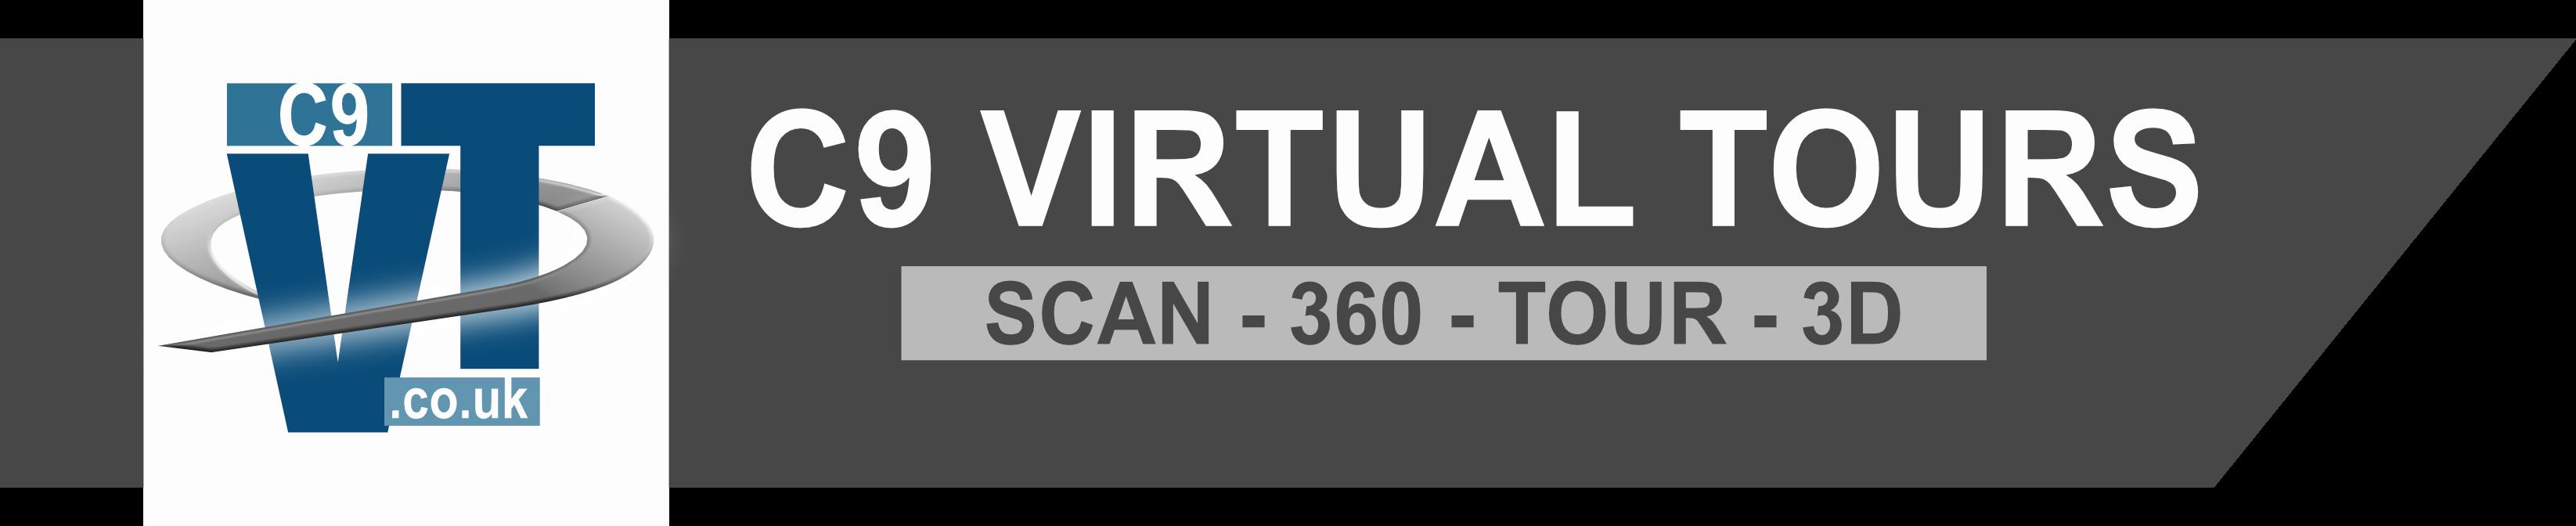 C9 Virtual Tours